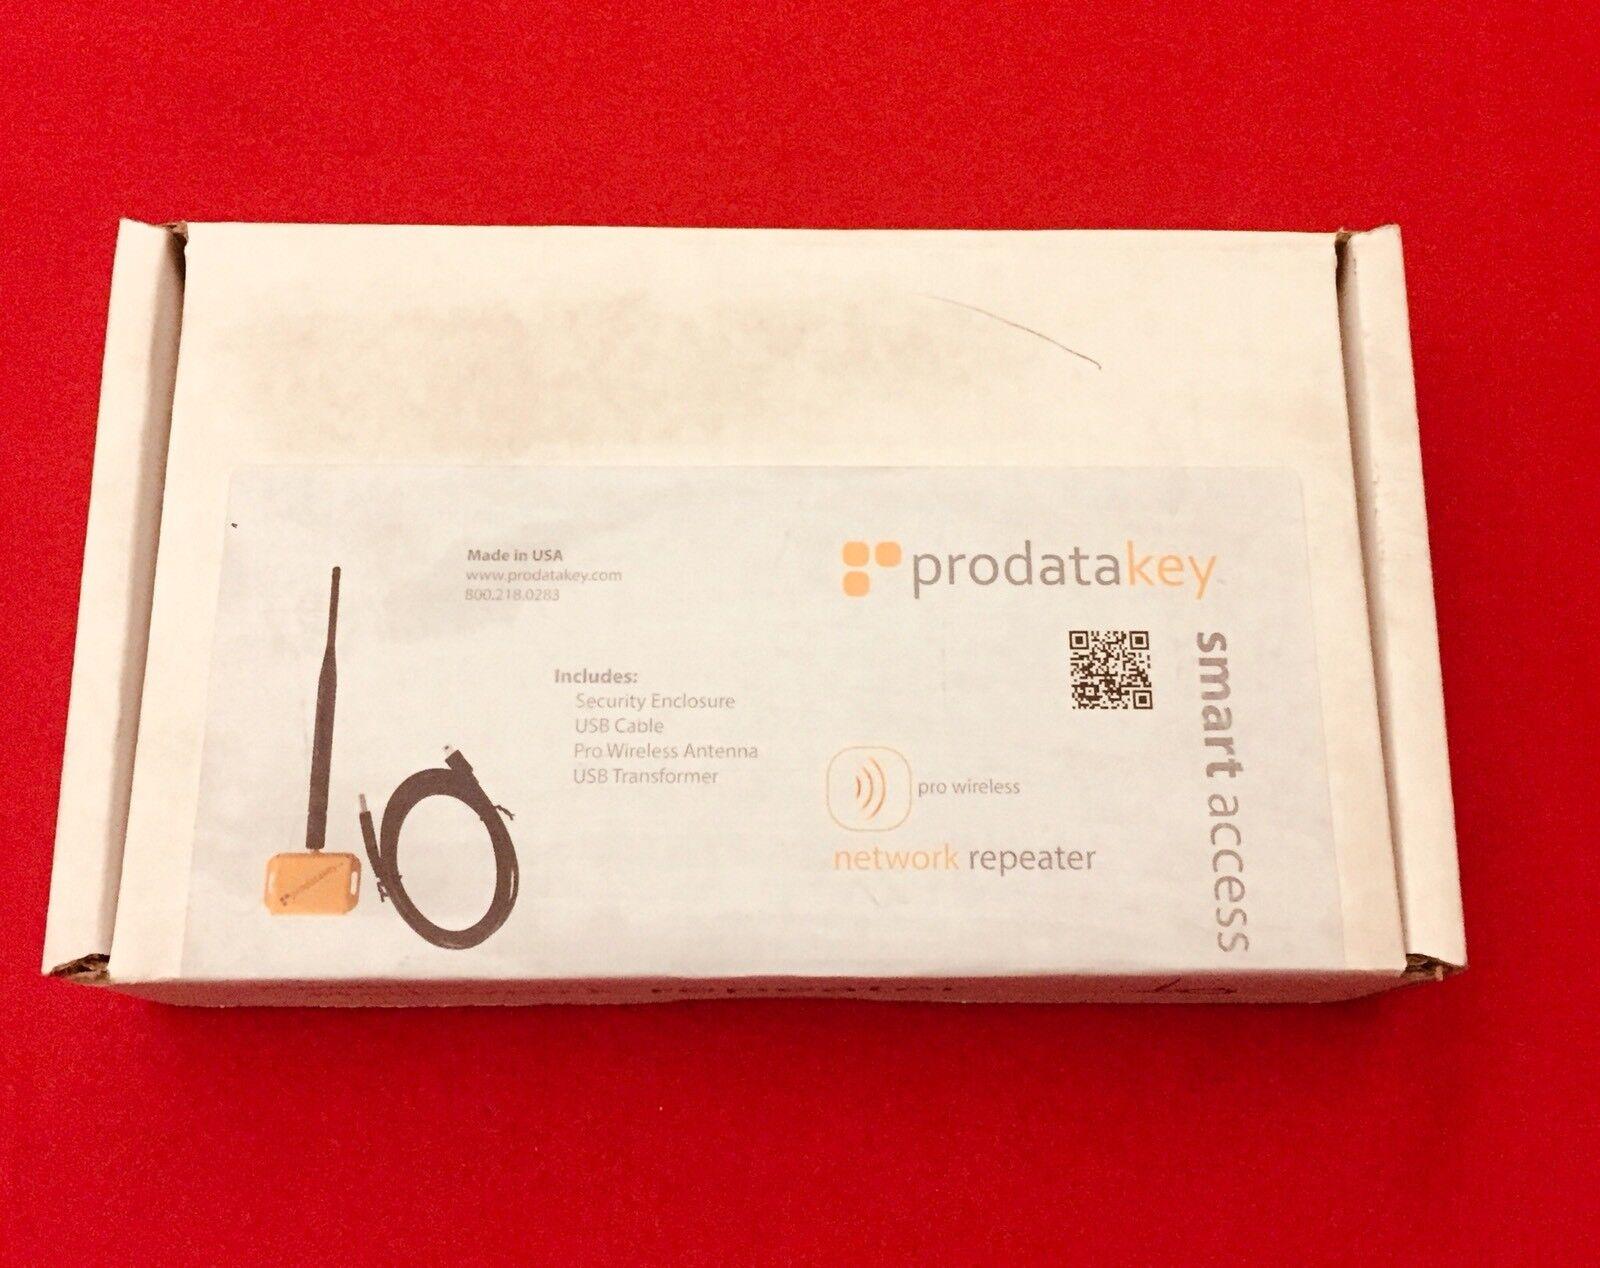 ProdataKey PM-05-MNR Pro-Wireless Mesh Network Repeater 5 DB Gain Antenna Prod